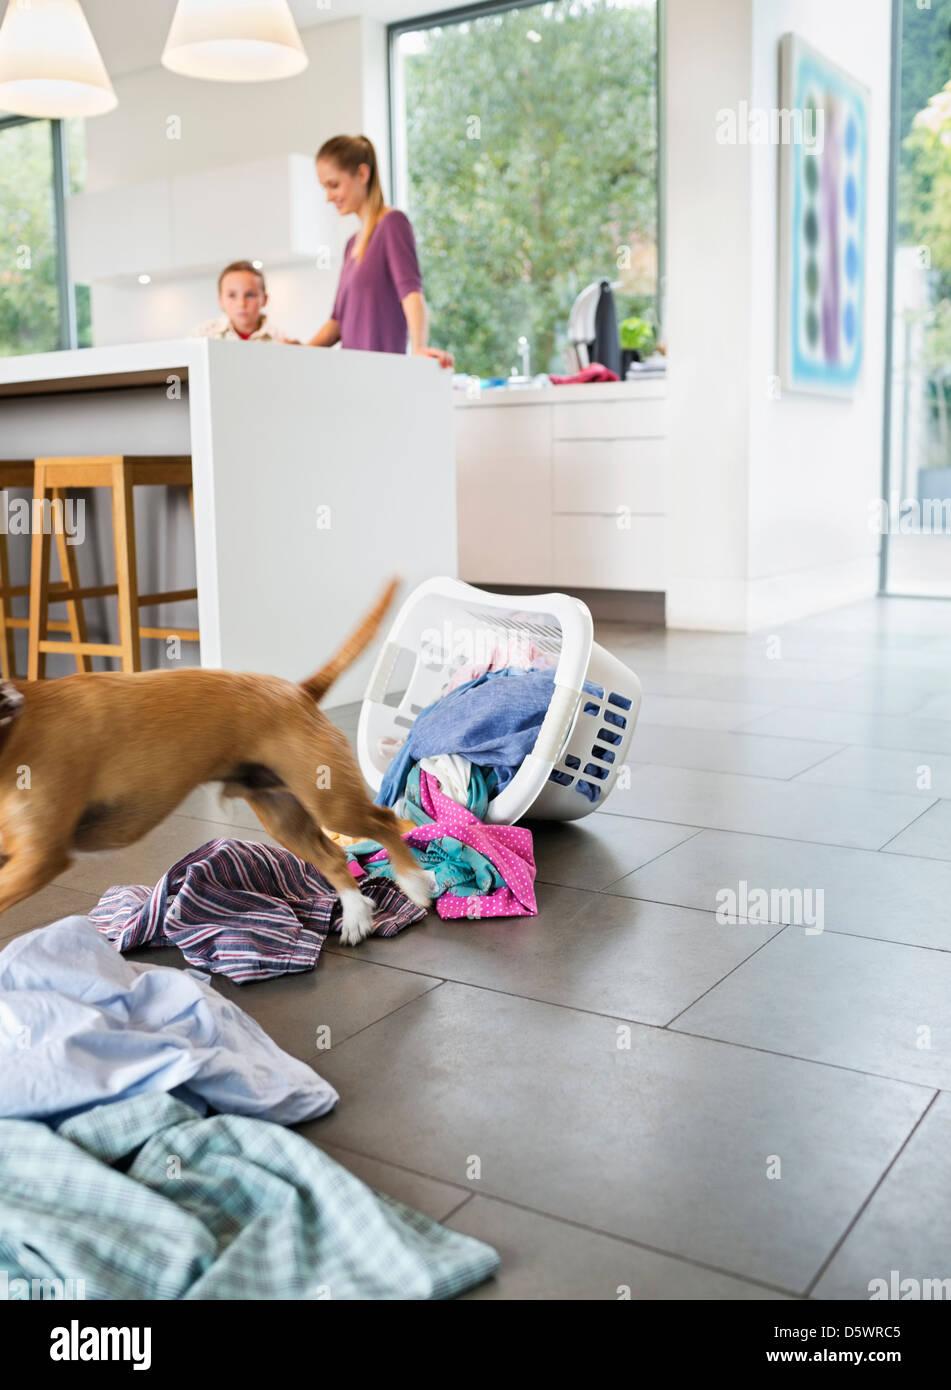 Dog making mess in kitchen - Stock Image